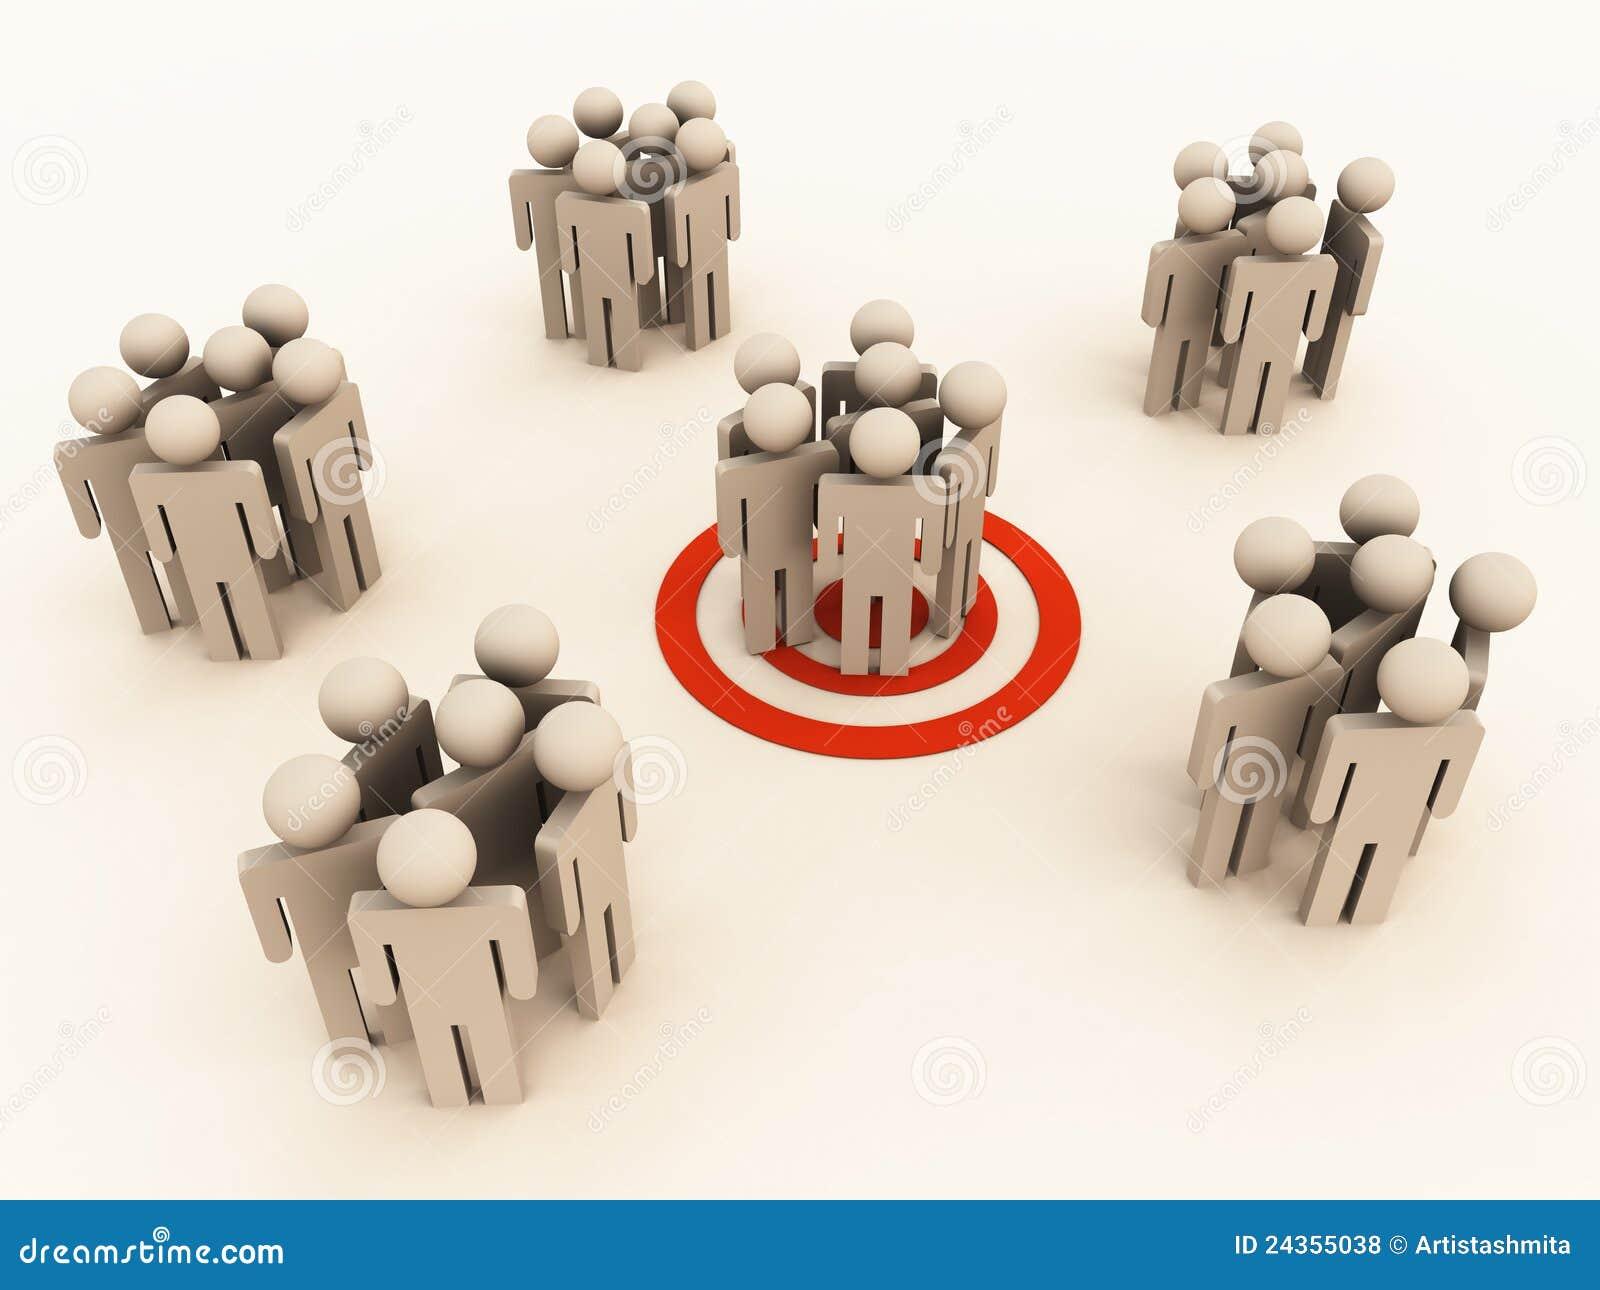 niche target group